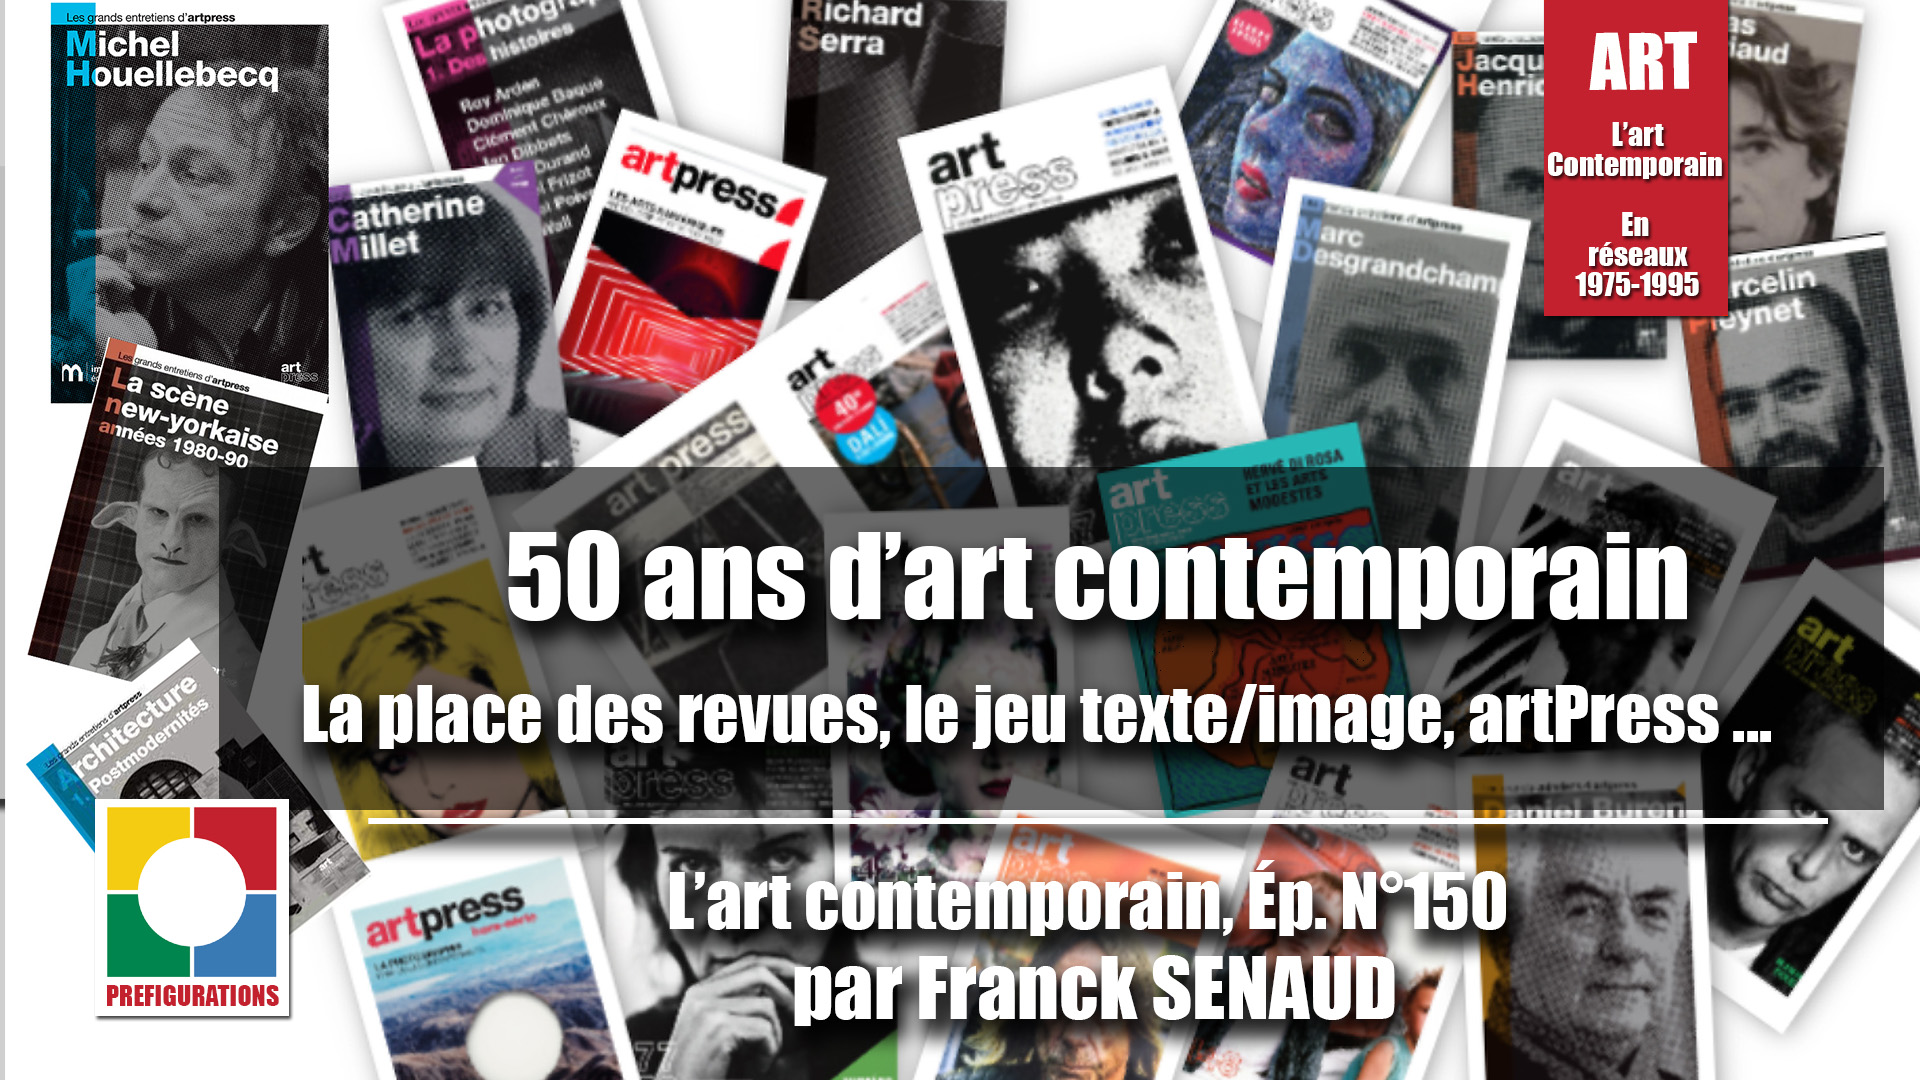 Lartcontemporain4 -episode-150-art-presse